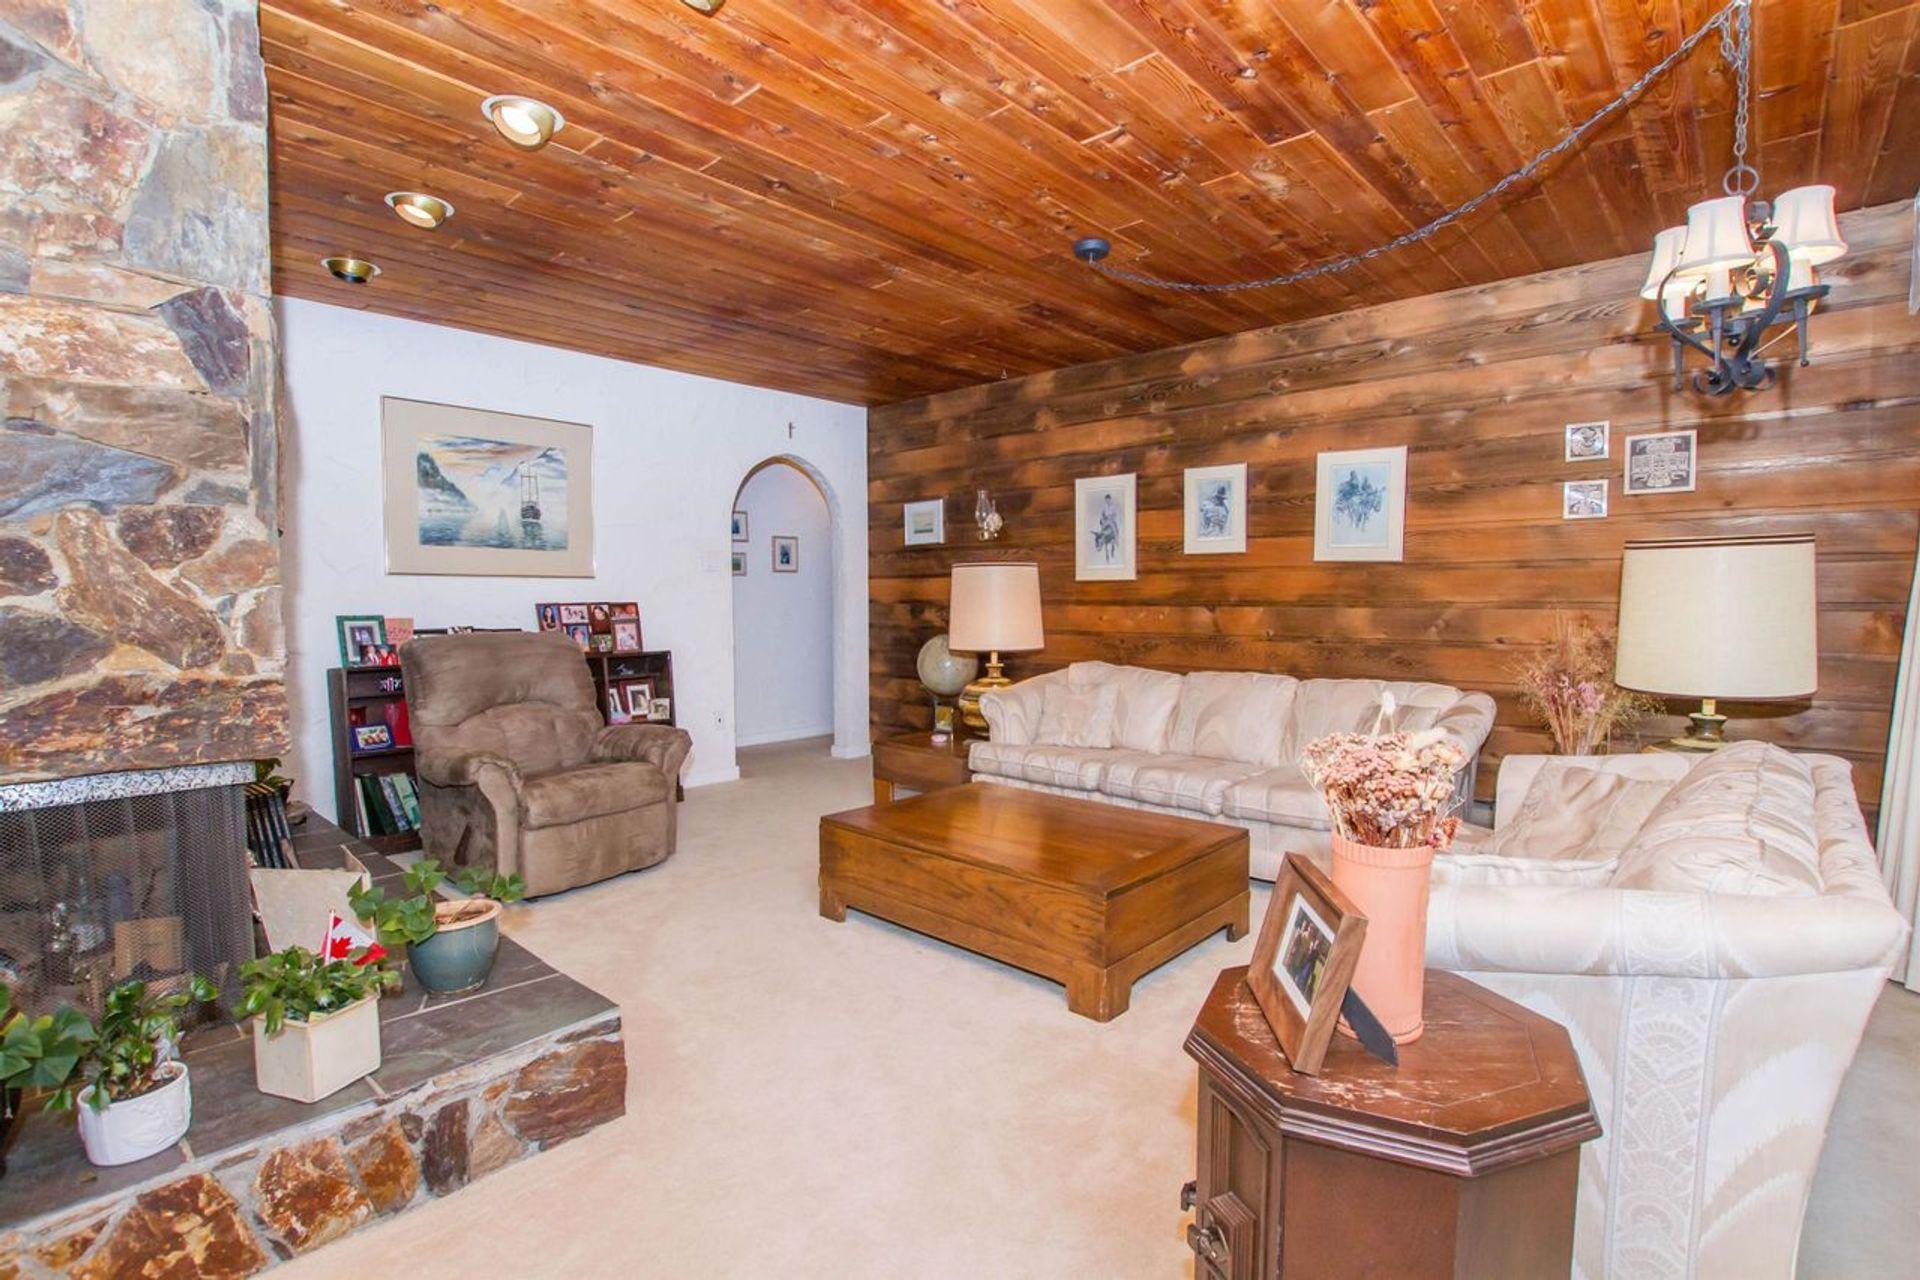 2040-diamond-road-garibaldi-estates-squamish-05 at 2040 Diamond Road, Garibaldi Estates, Squamish